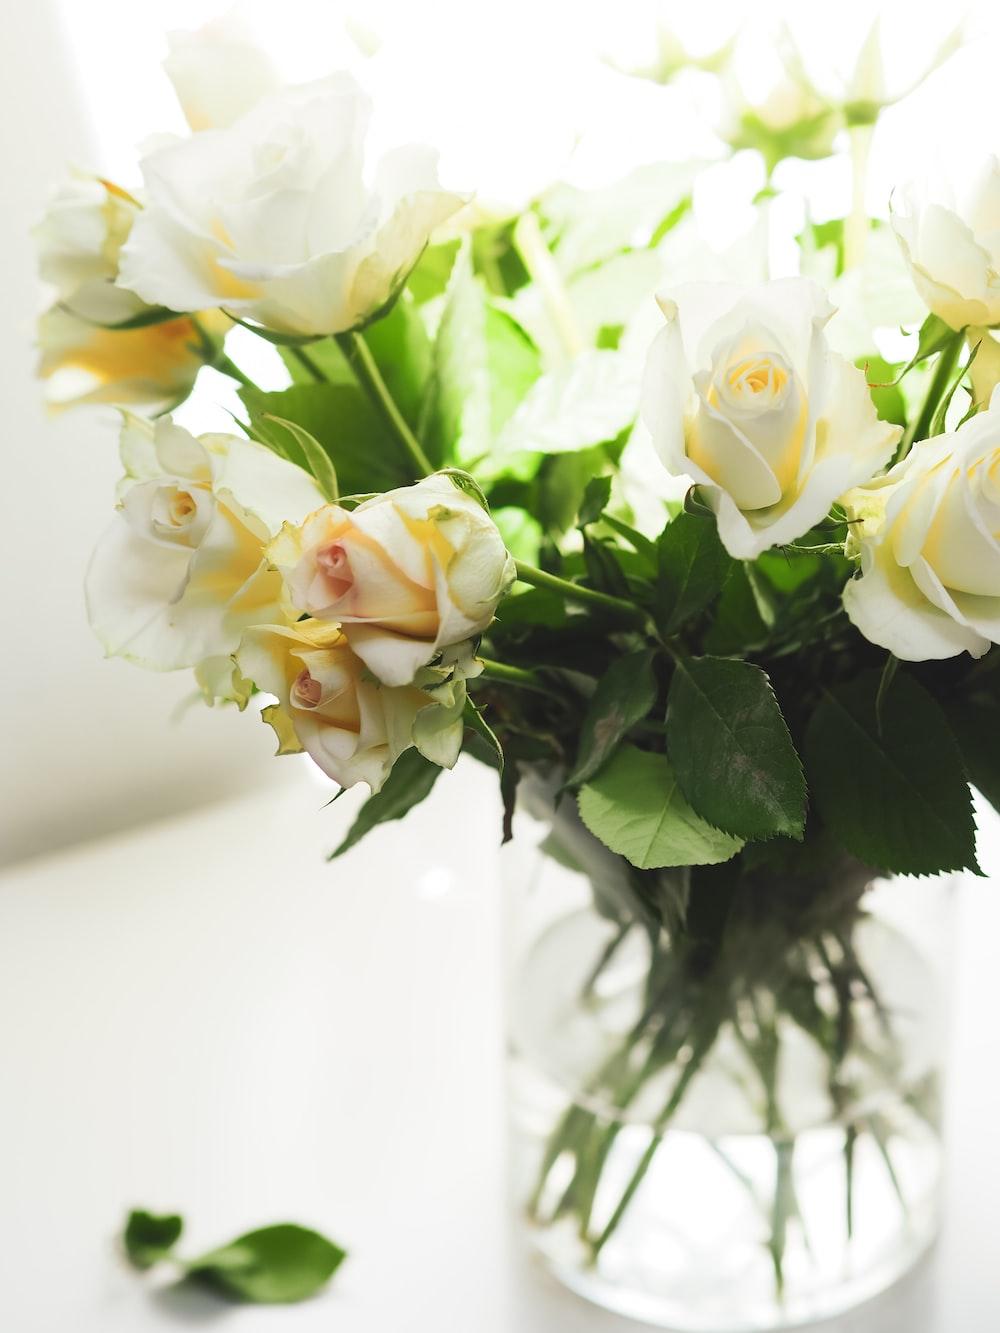 white roses in white vase